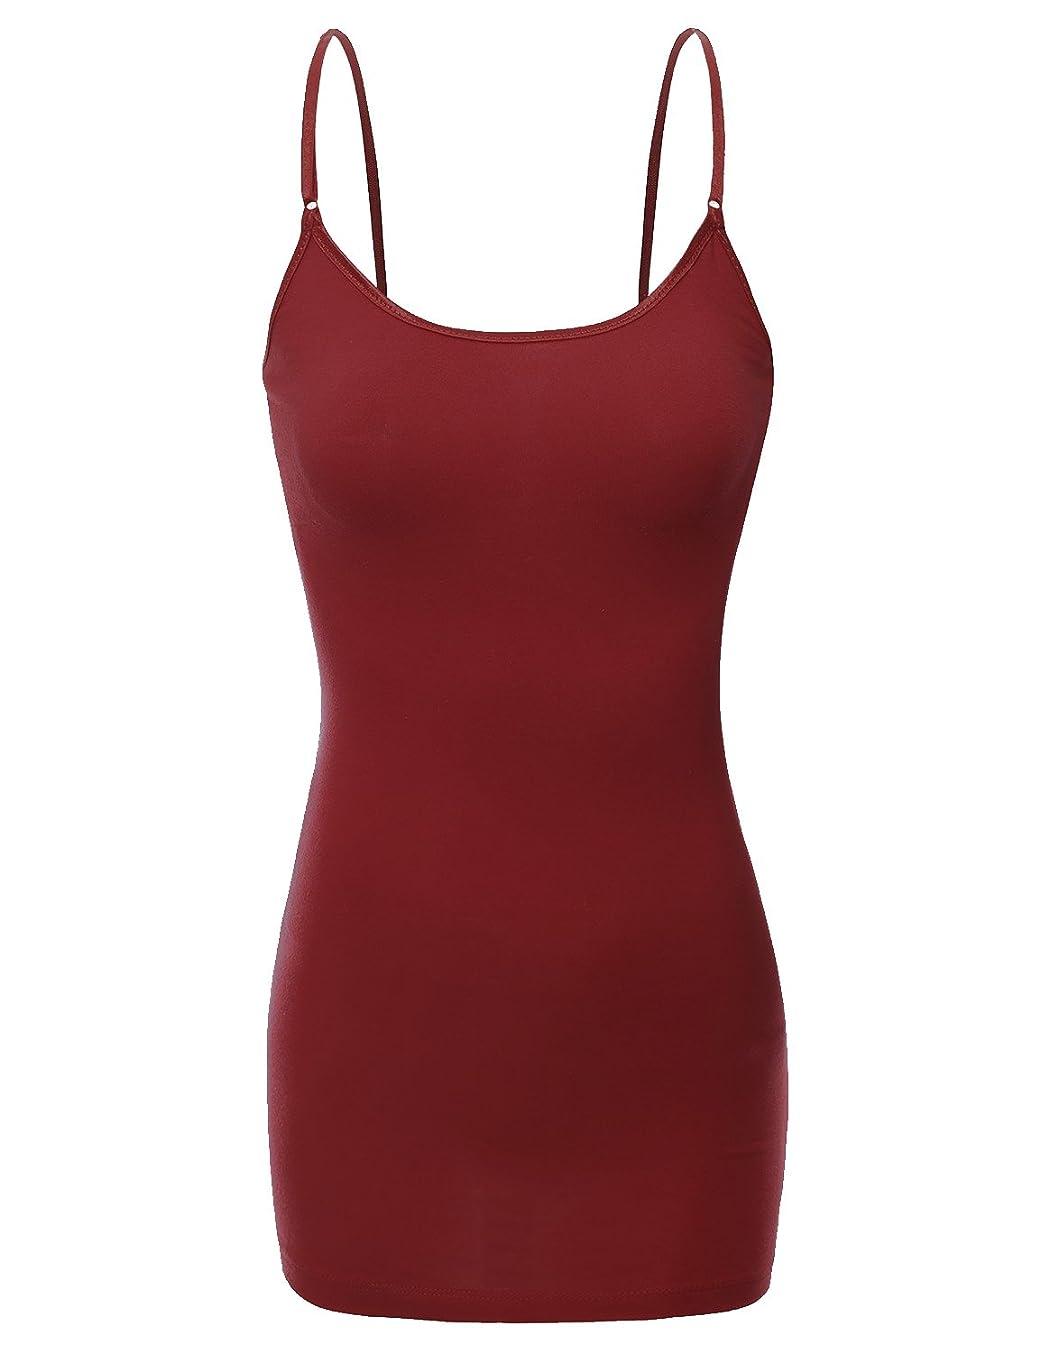 Bozzolo Women's Ladies Adjustable Spaghetti Strap Basic Long Cami Tunic Tank Top